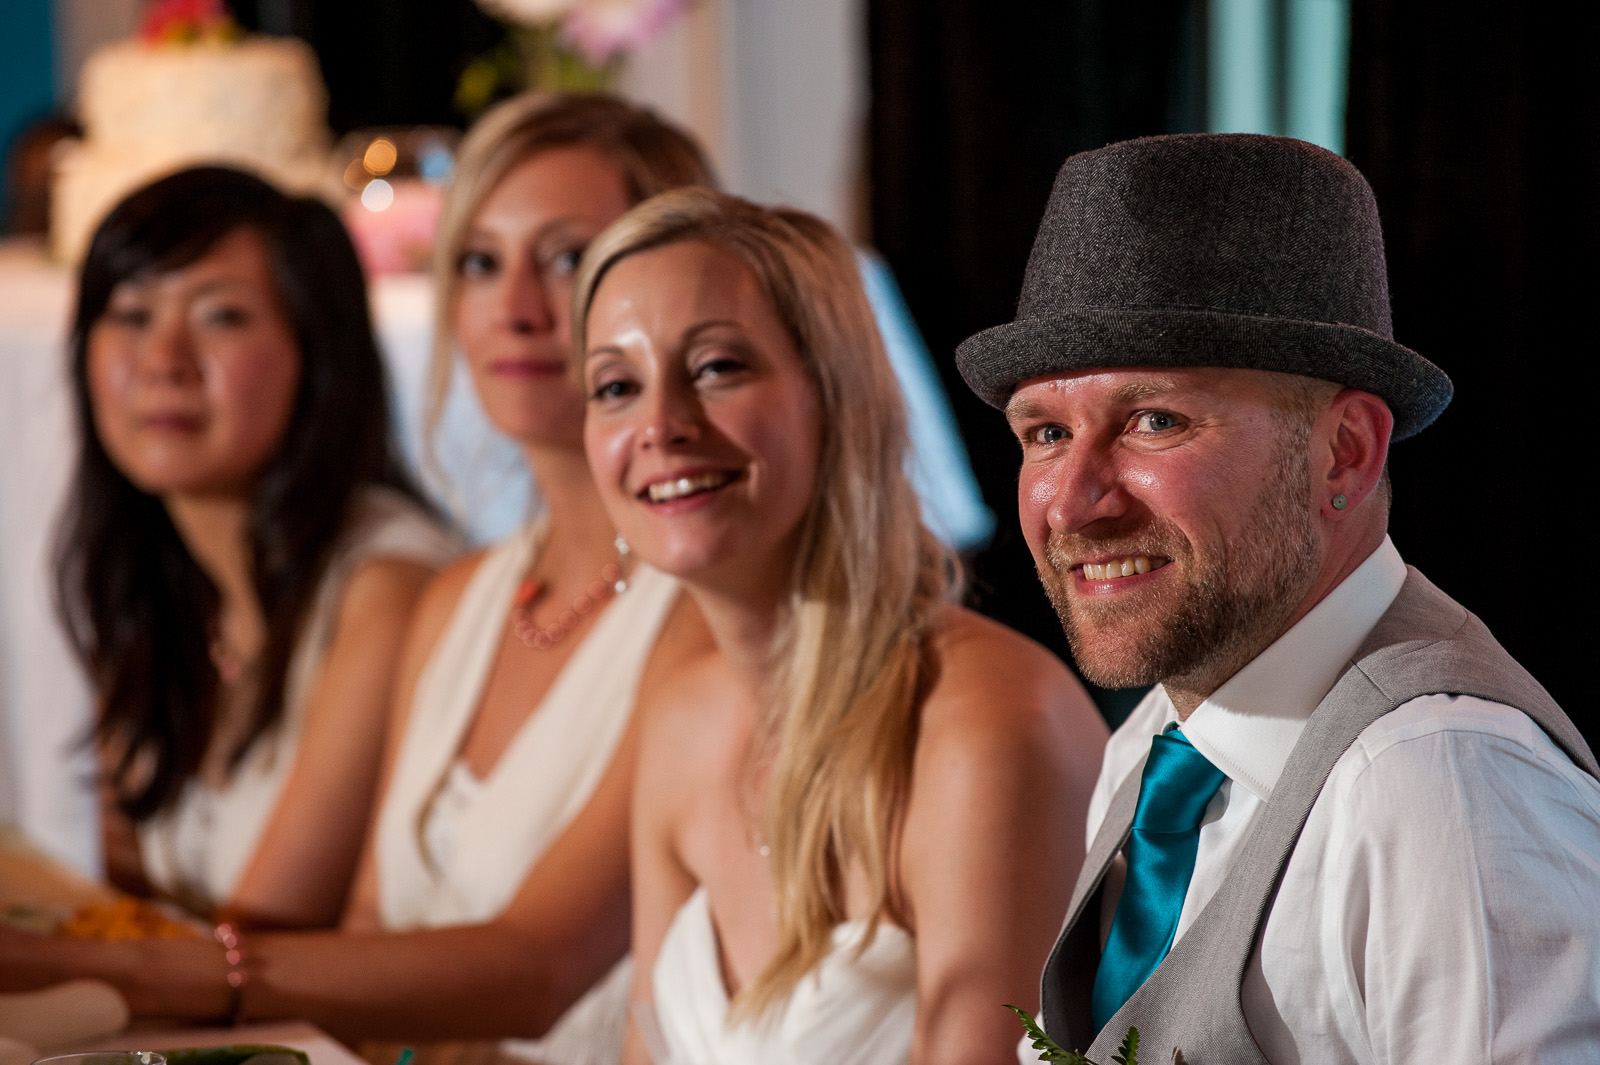 bc-wedding-photographers-cleveland-dam-wedding-29.jpg